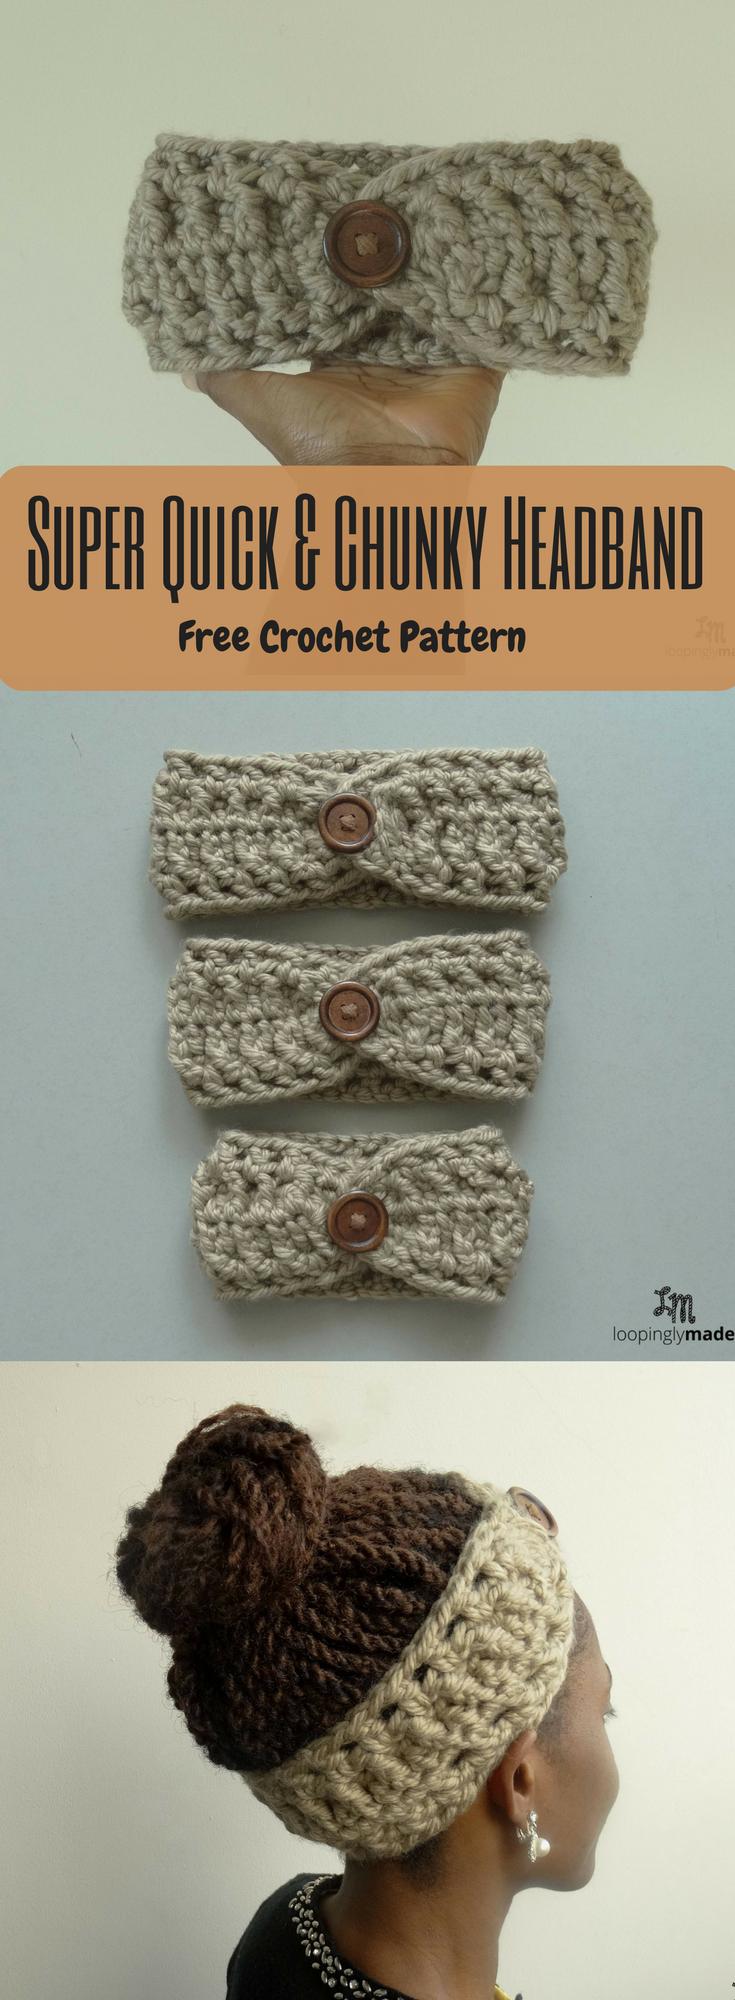 Super Quick and Chunky Headband- Free Crochet Pattern #crochetedheadbands